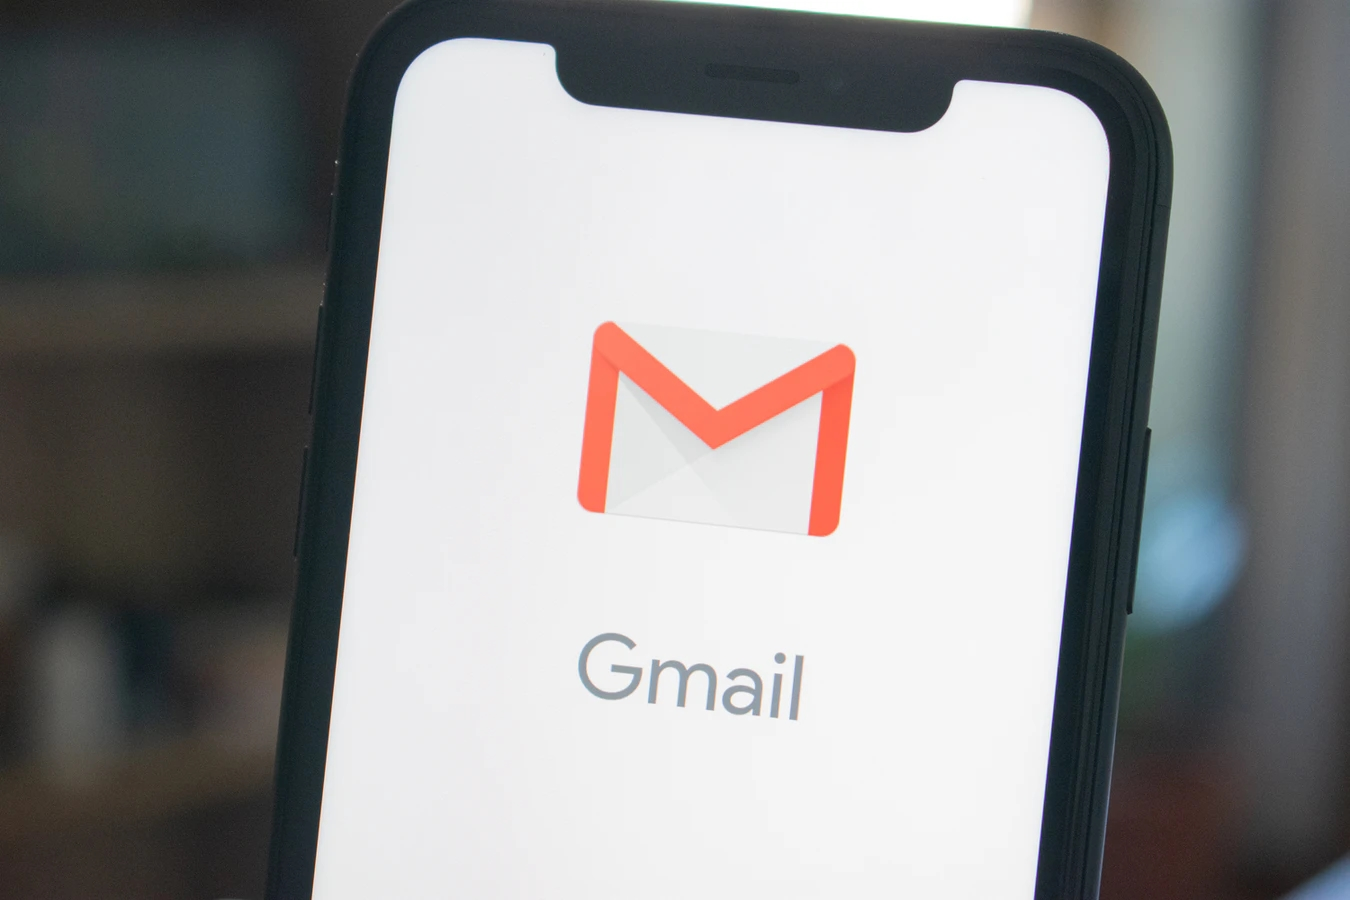 Gmail app smartphone